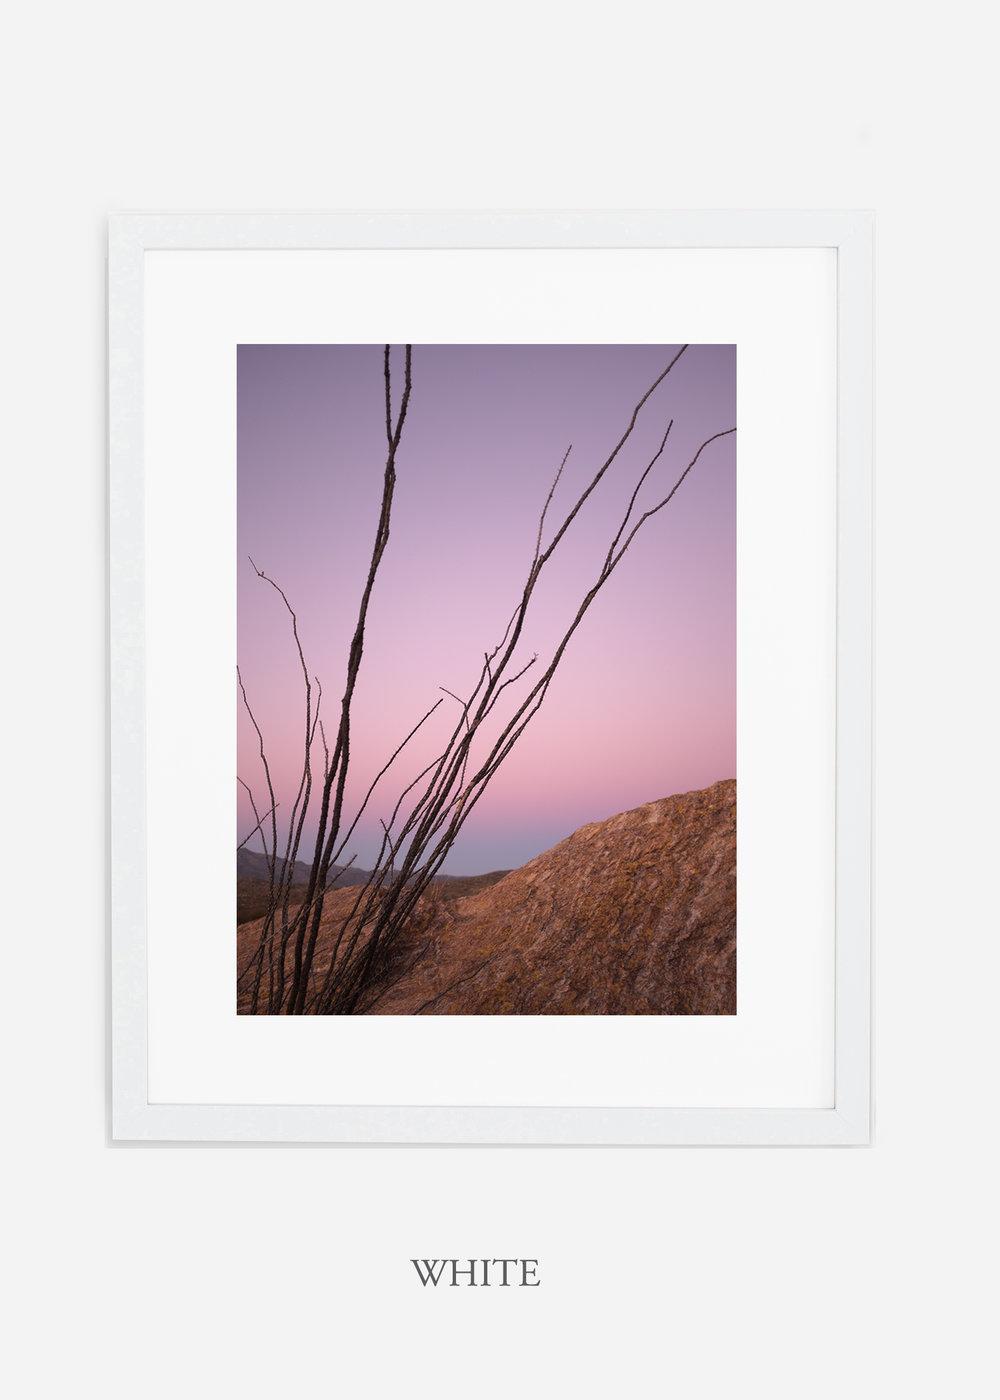 whiteframe-saguaroNo.12-wildercalifornia-art-wallart-cactusprint-homedecor-prints-arizona-botanical-artwork-interiordesign.jpg